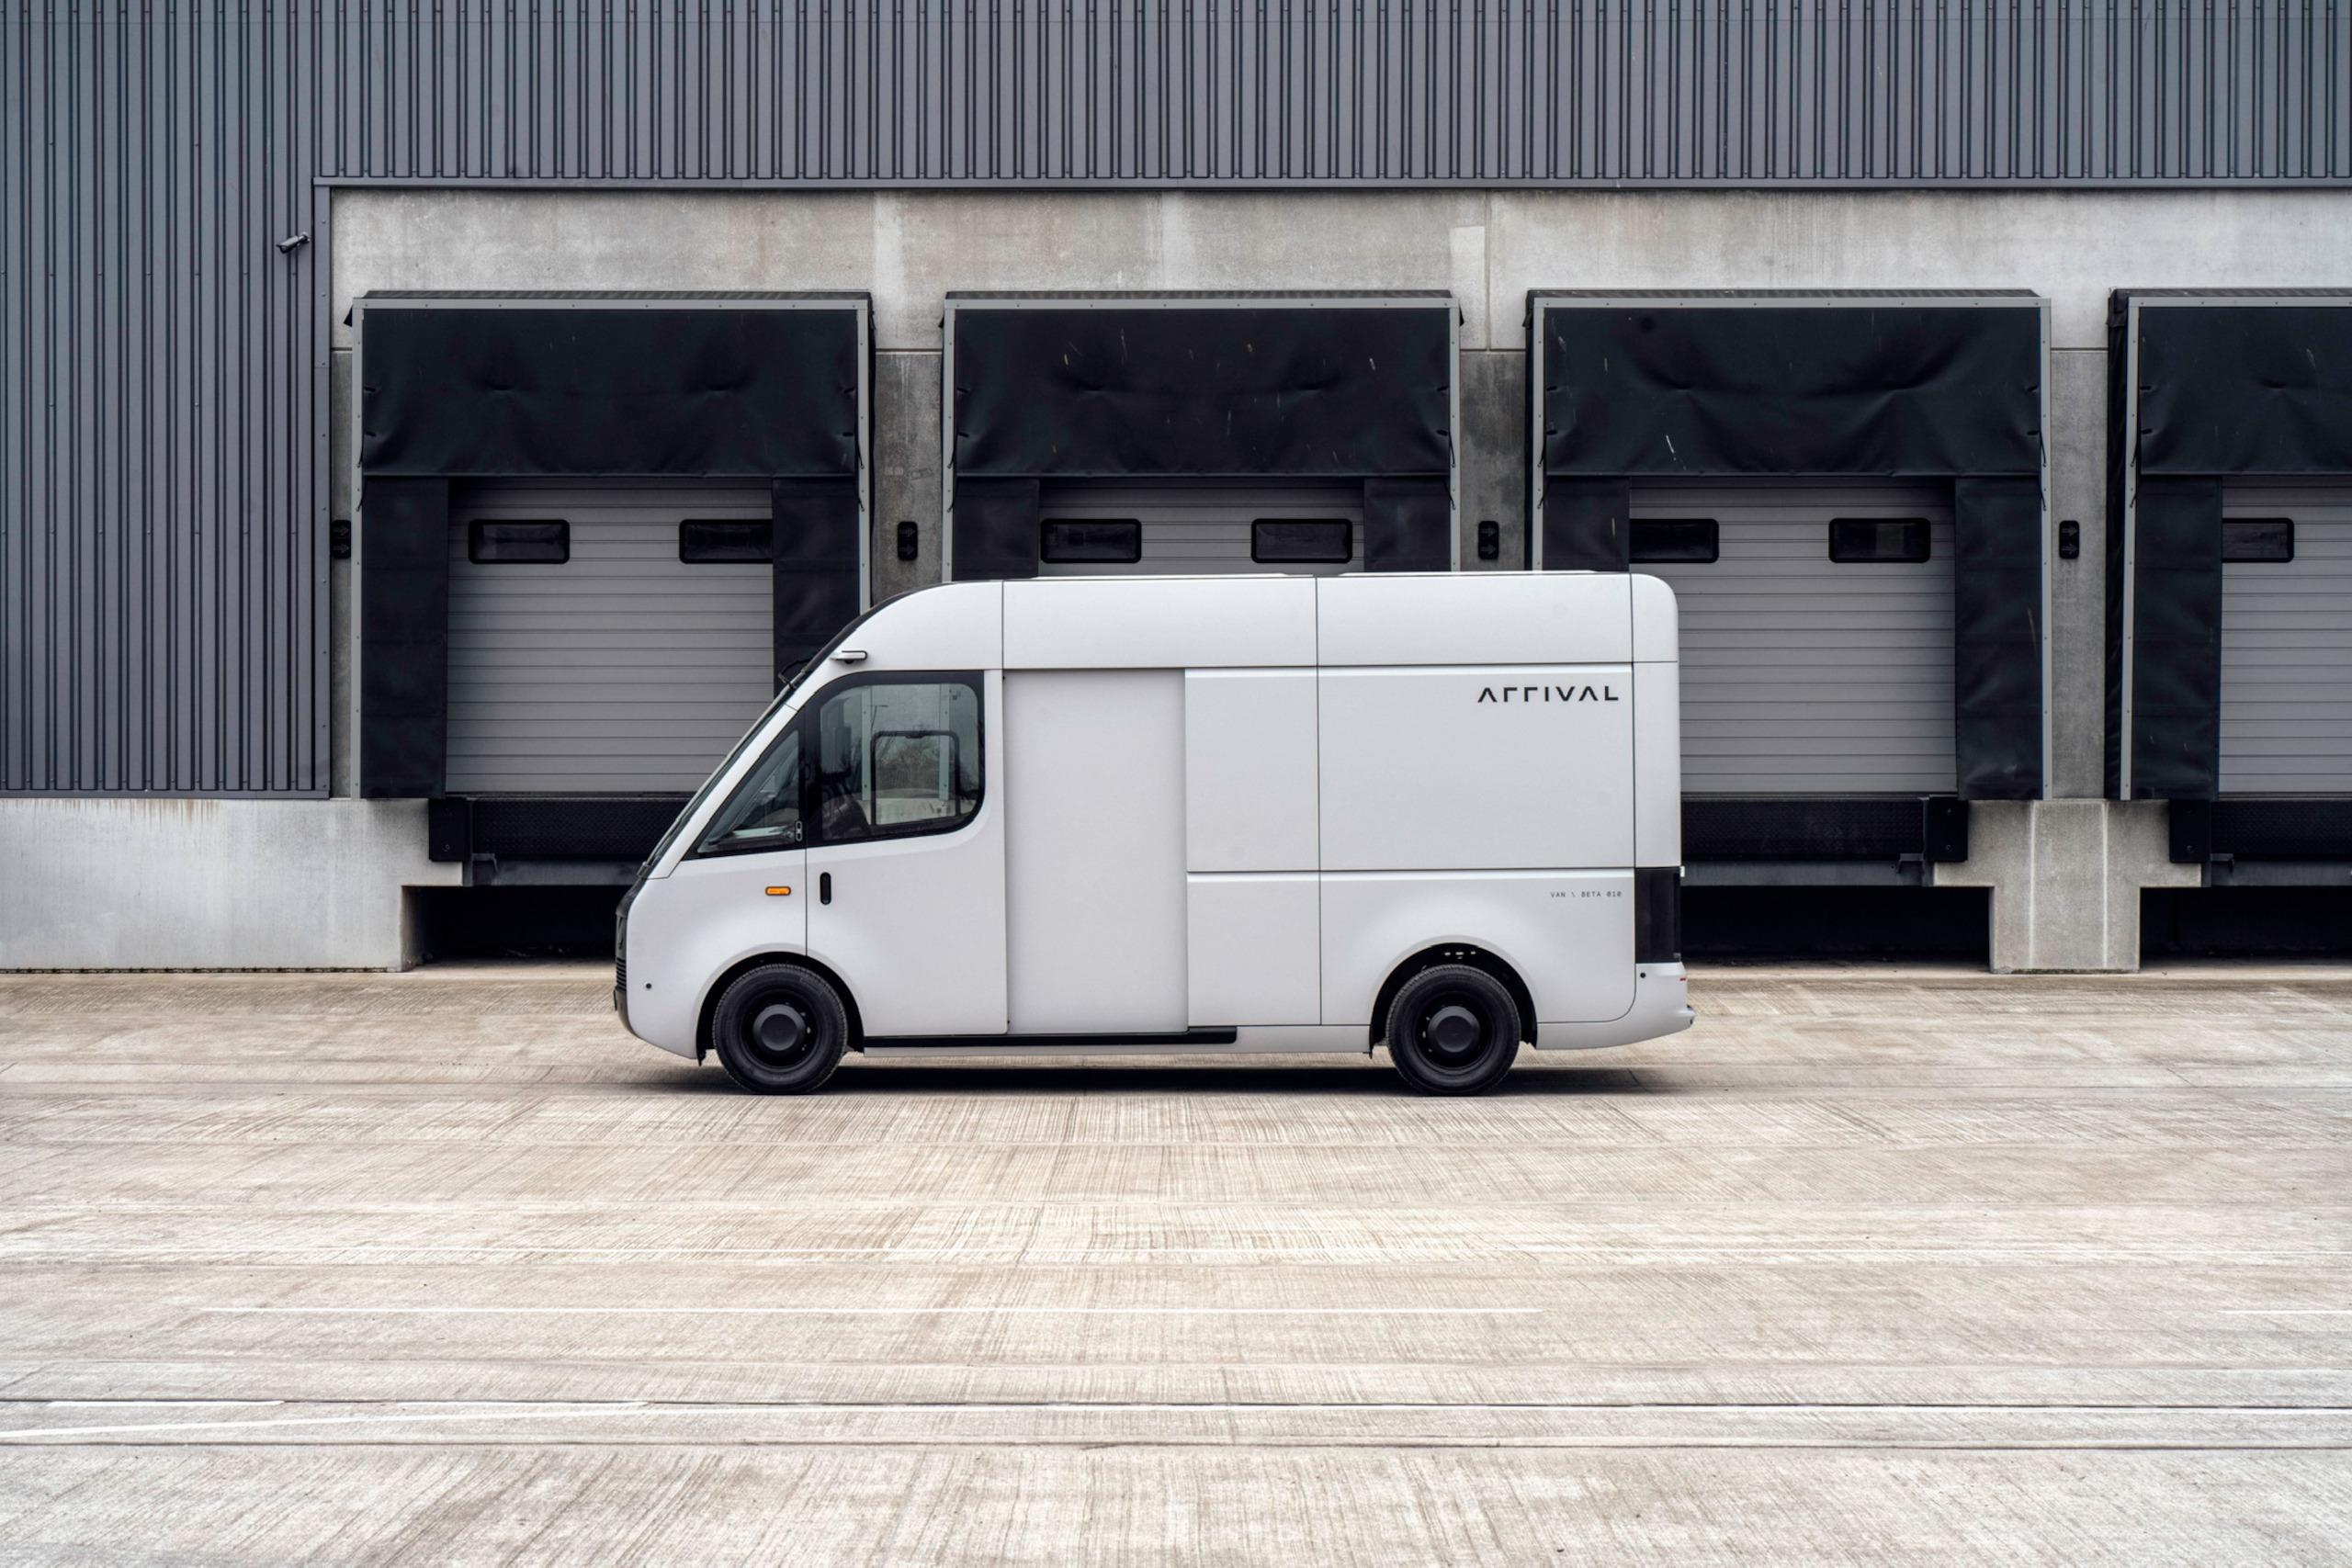 Arrival Electric Van